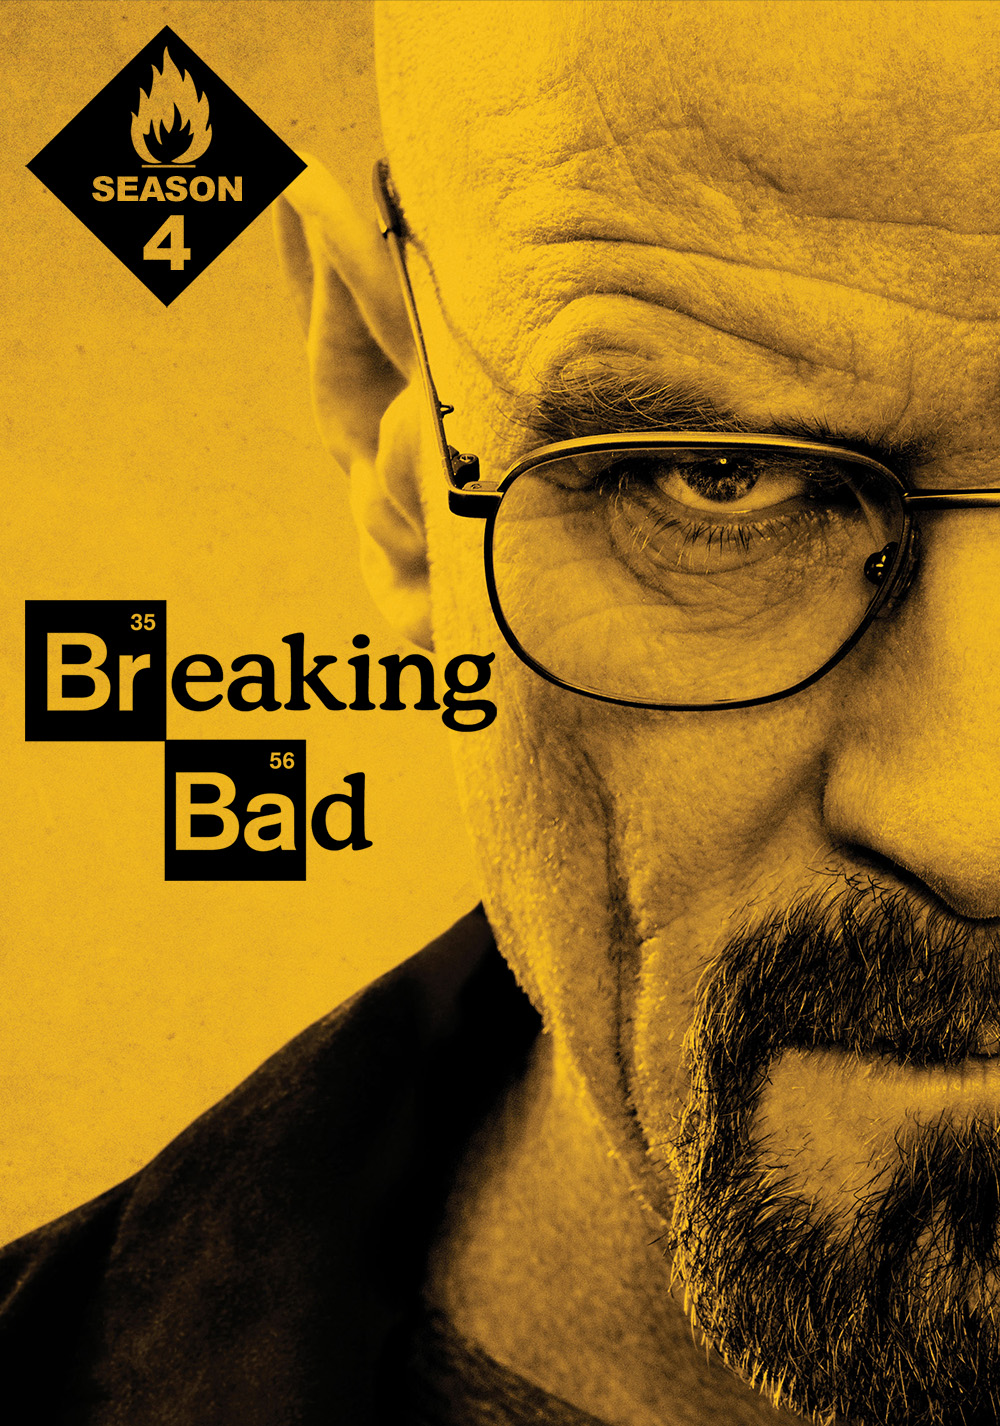 Breaking Bad (TV Series 2008–2013) - Full Cast & Crew - IMDb